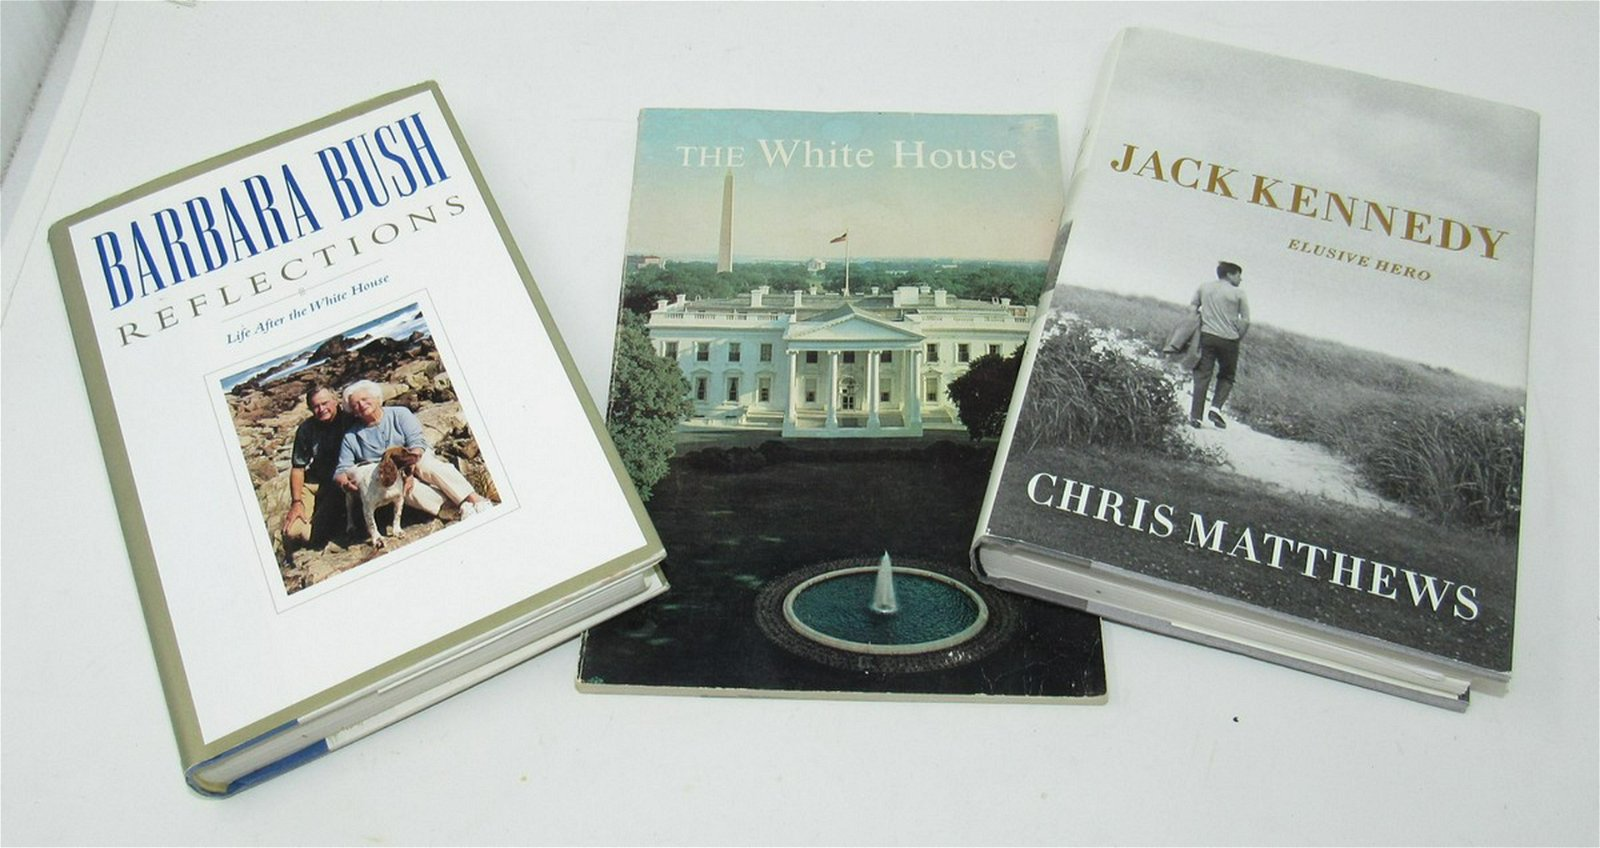 White House Barbara Bush Jack Kennedy Books